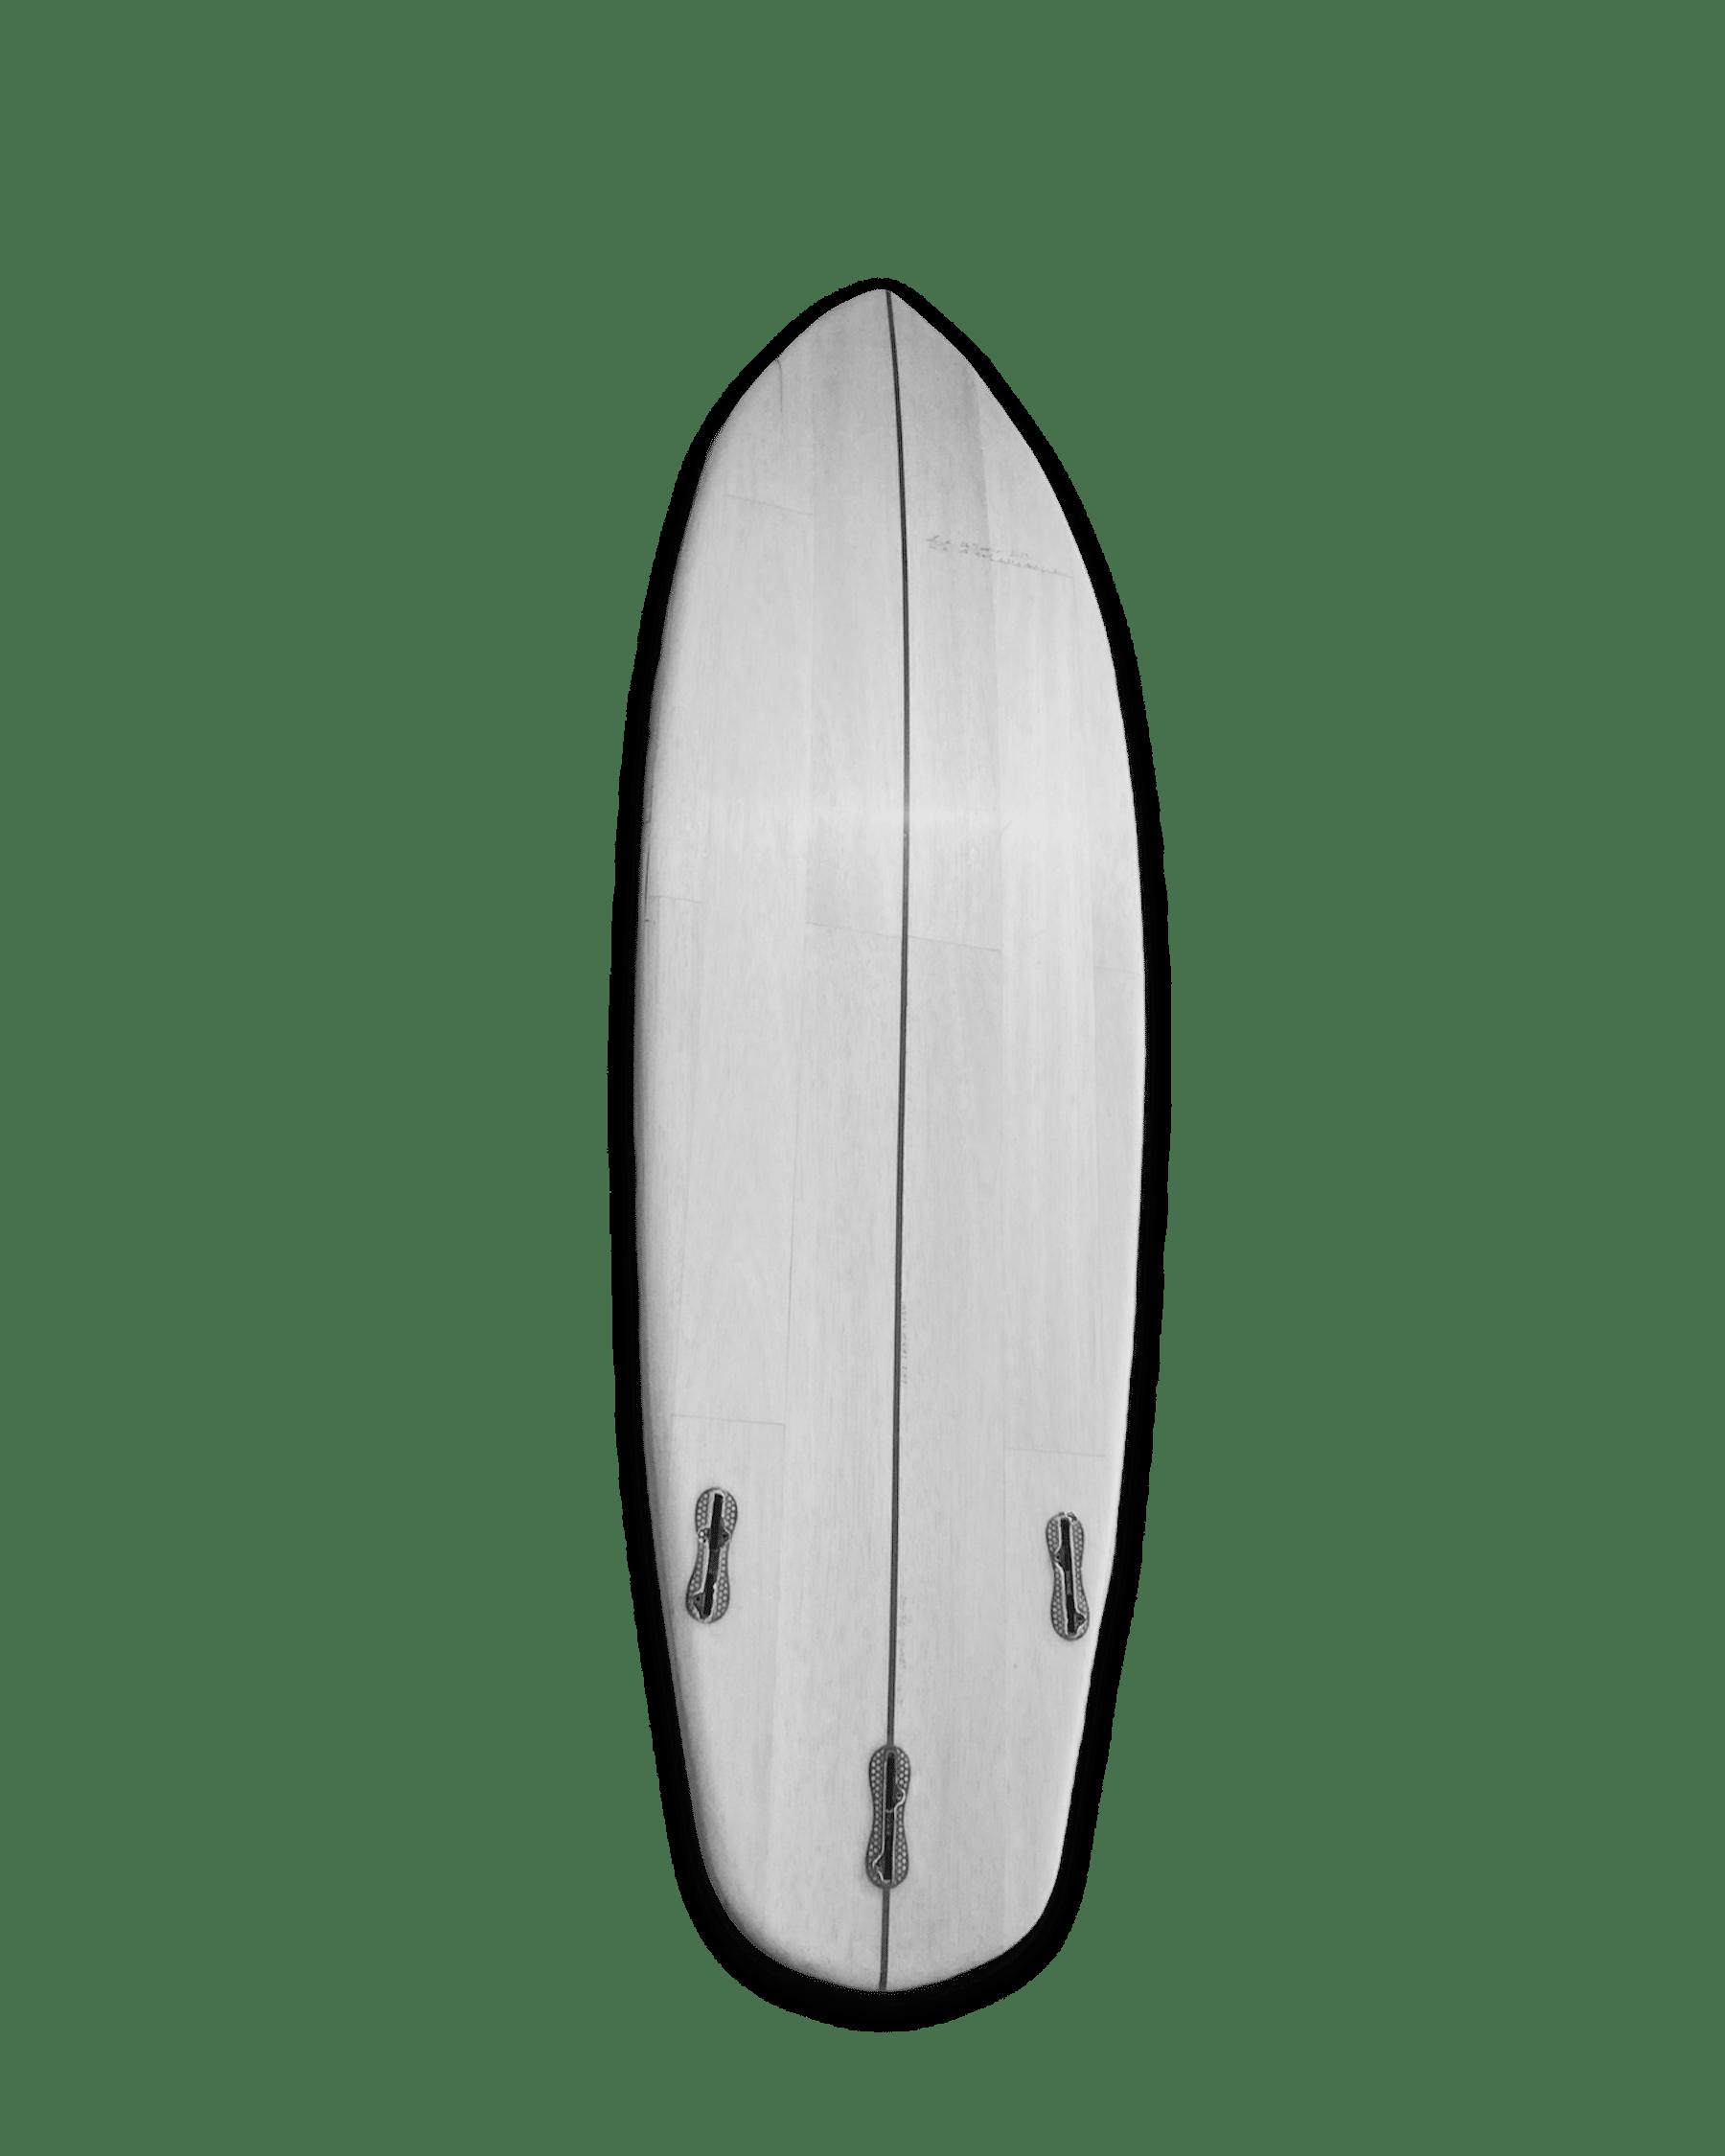 iconic wood surf